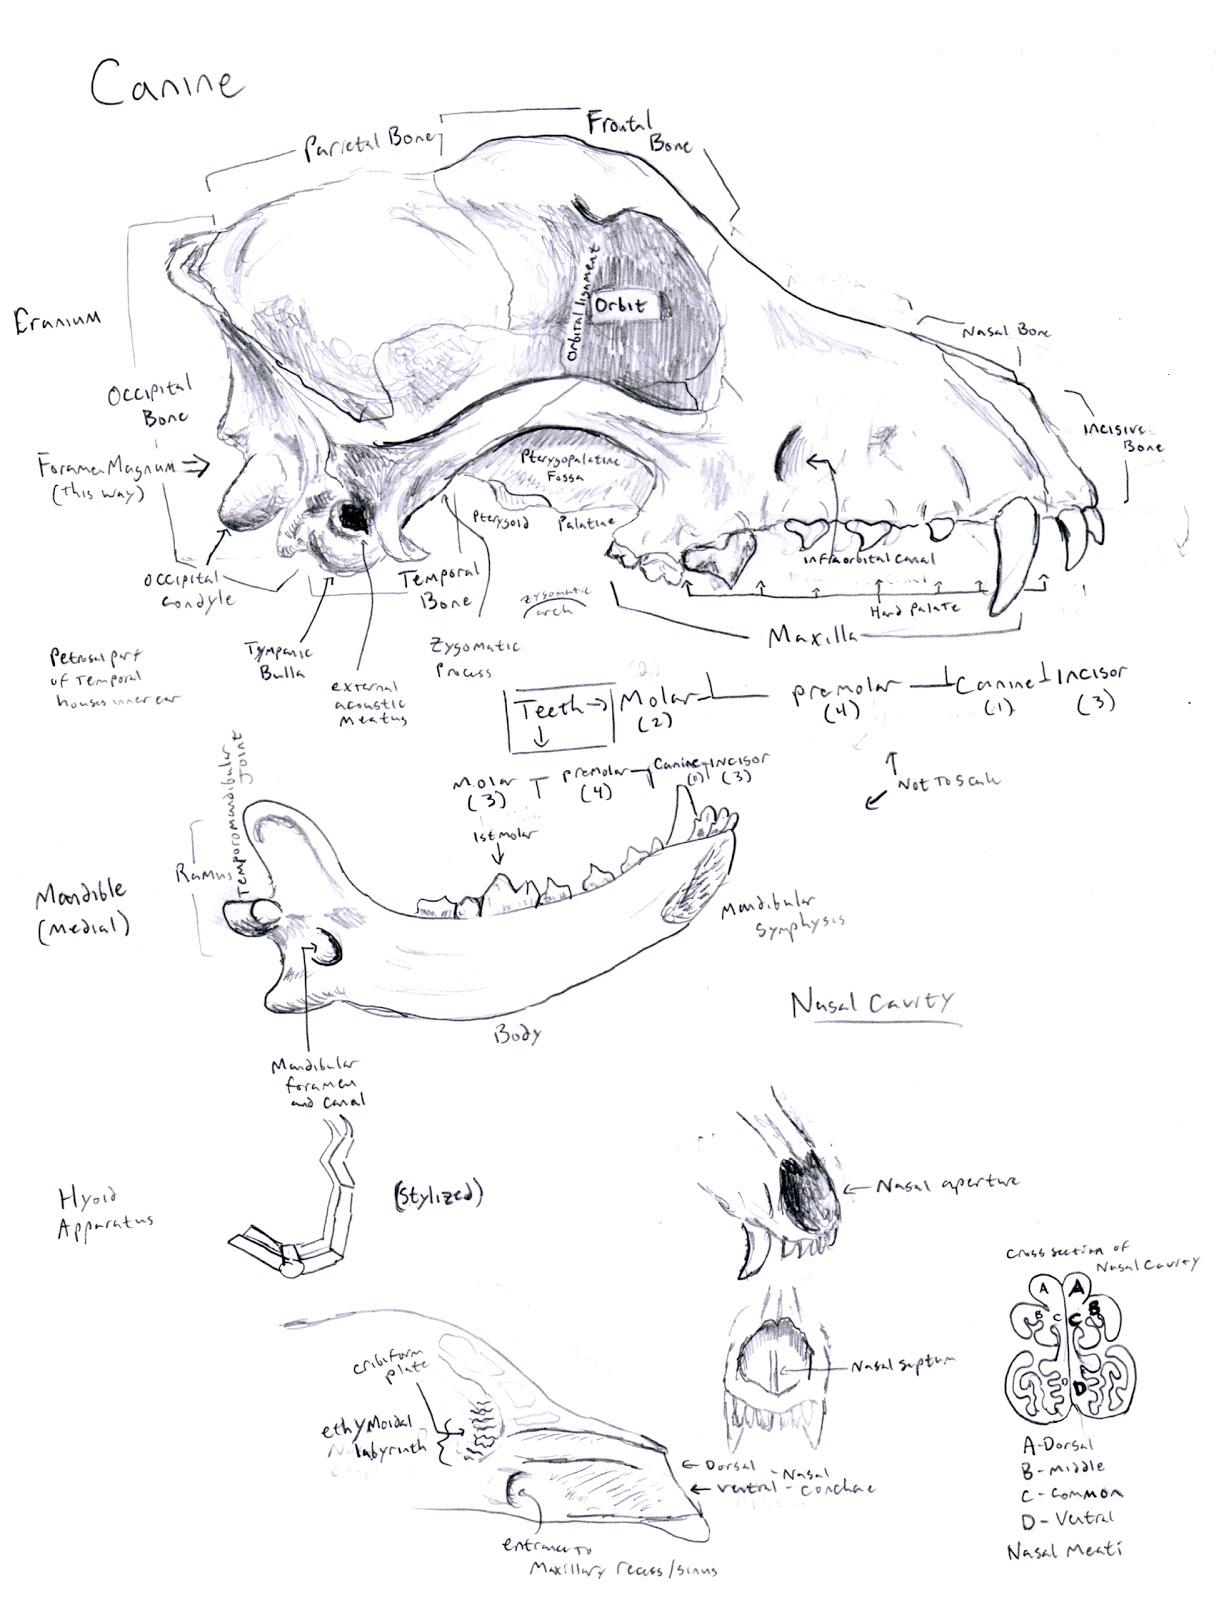 Chuck Does Art: Canine Osteology: Skull